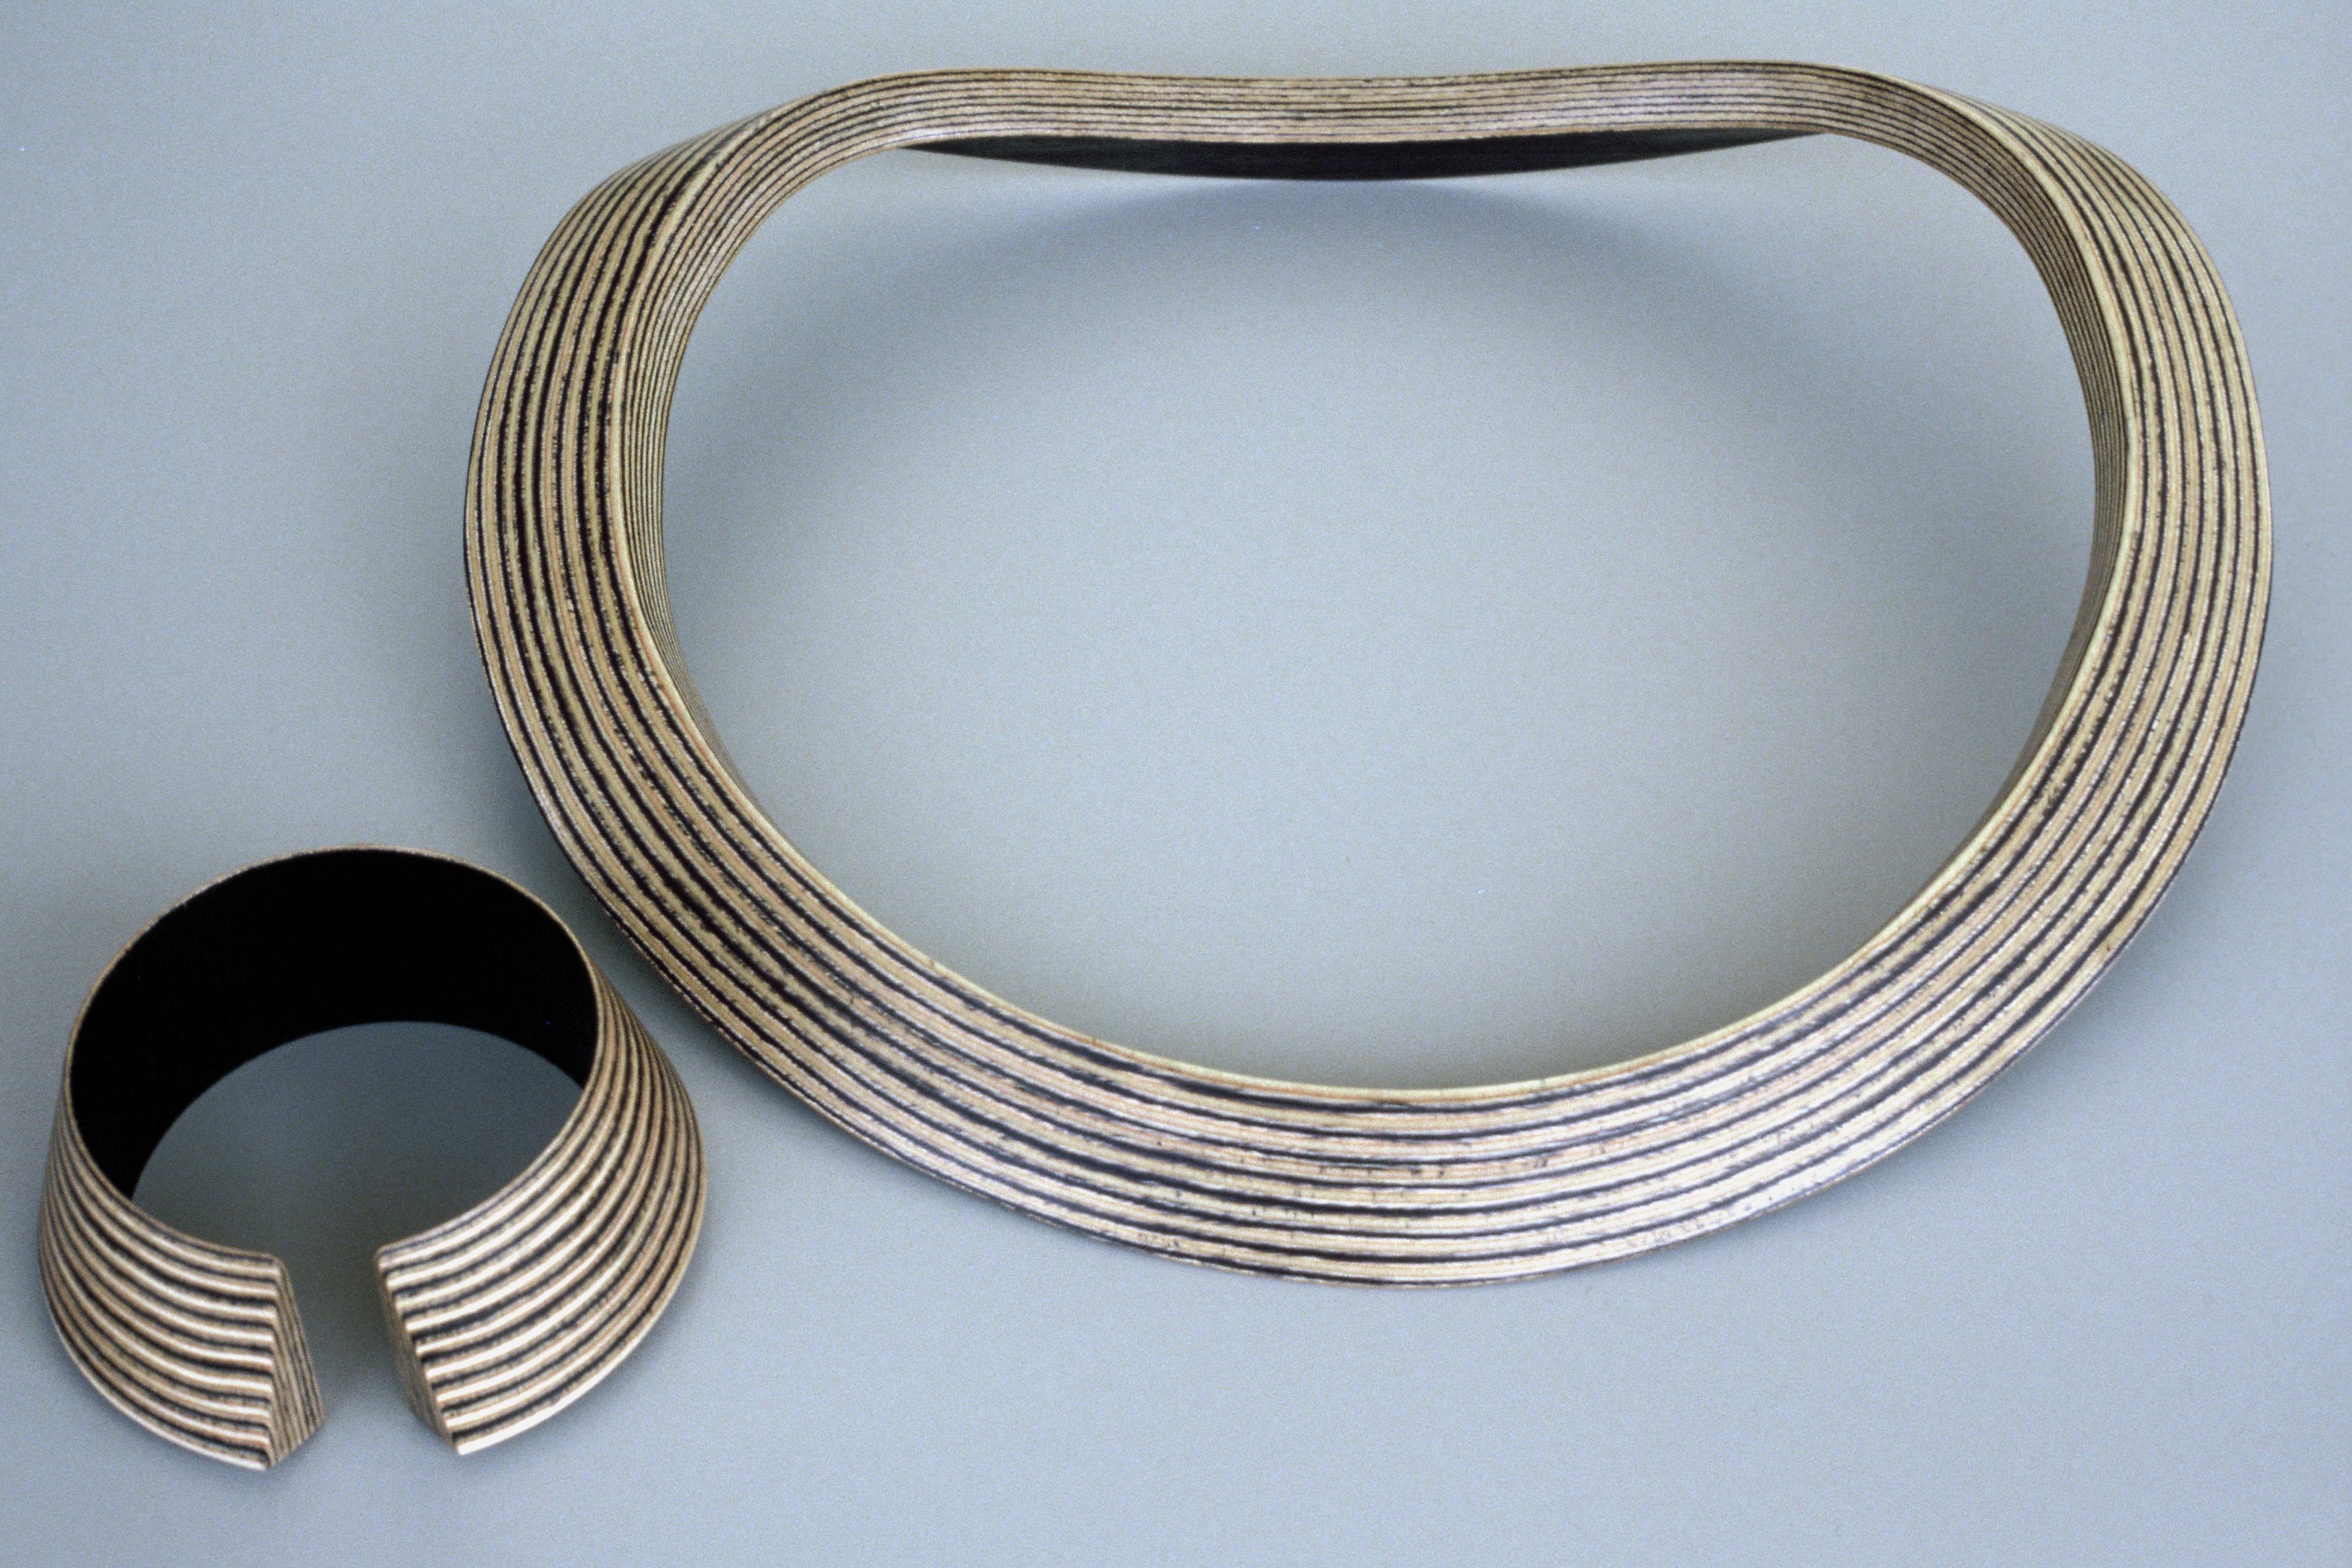 Maria Hees, Padova, armband en halssieraad, 1985. Collectie MOMA, hout